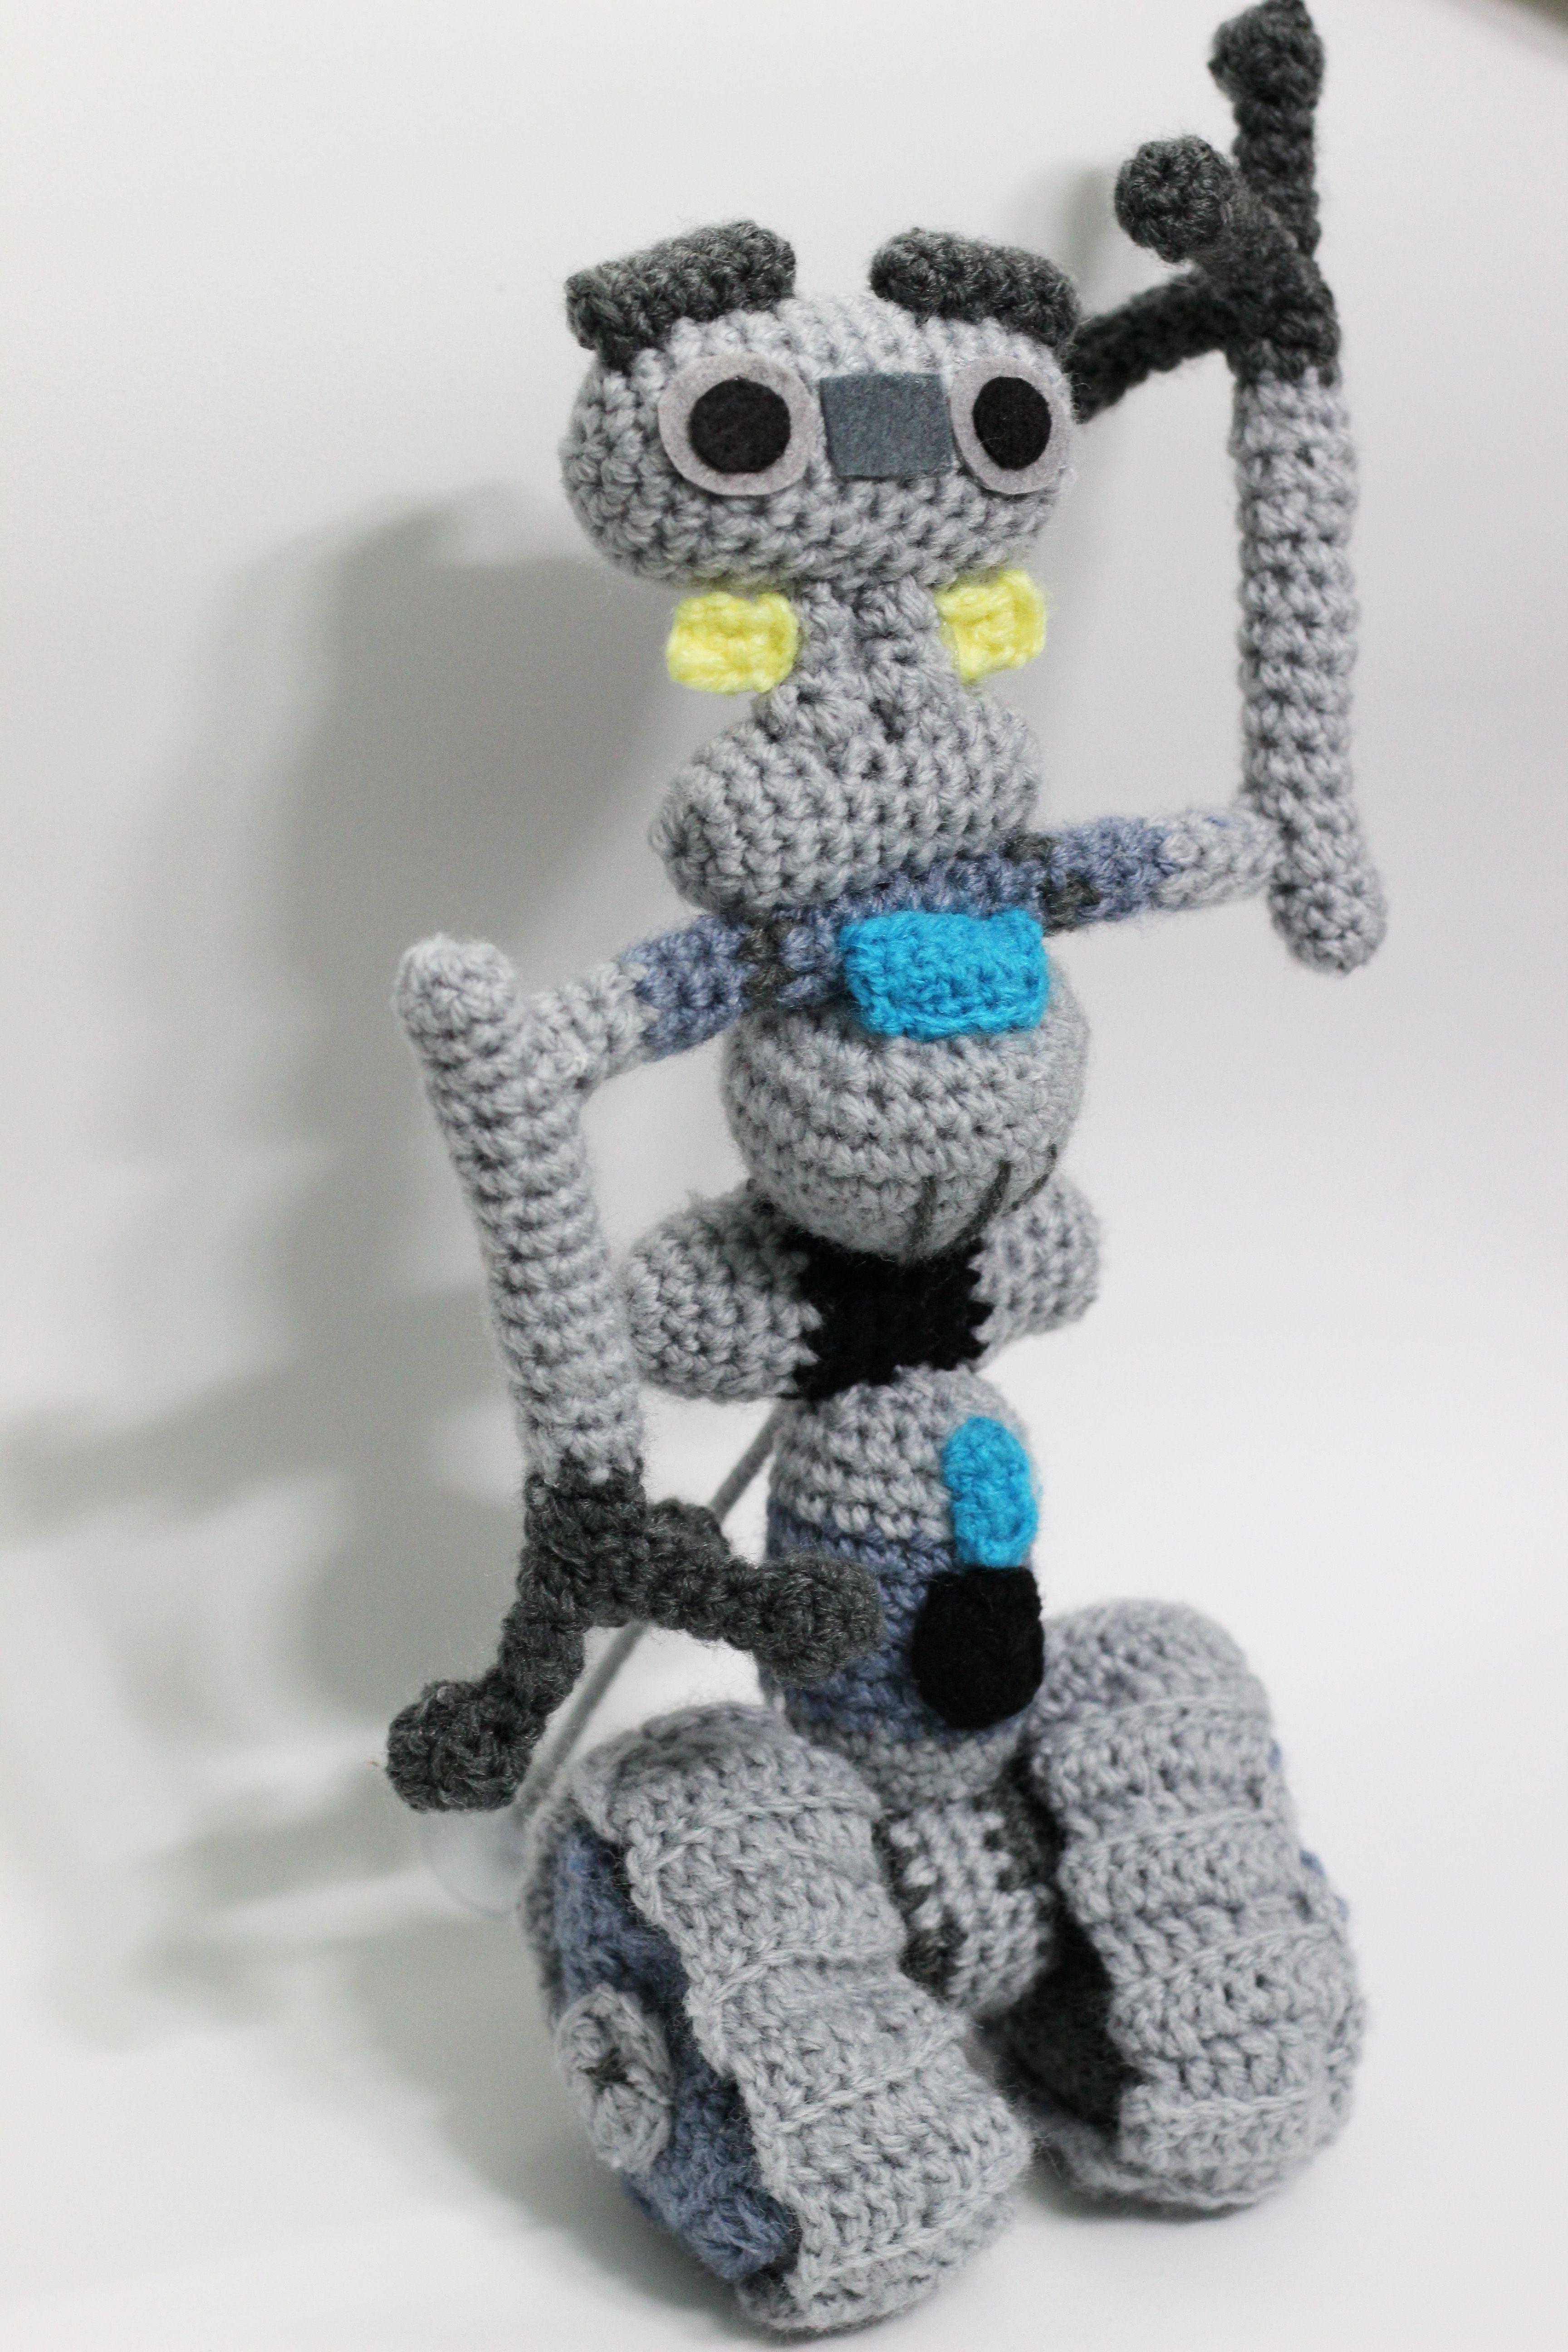 Blue Robot Crochet Pattern Robot Amigurumi Pattern Crochet | Etsy | 5184x3456